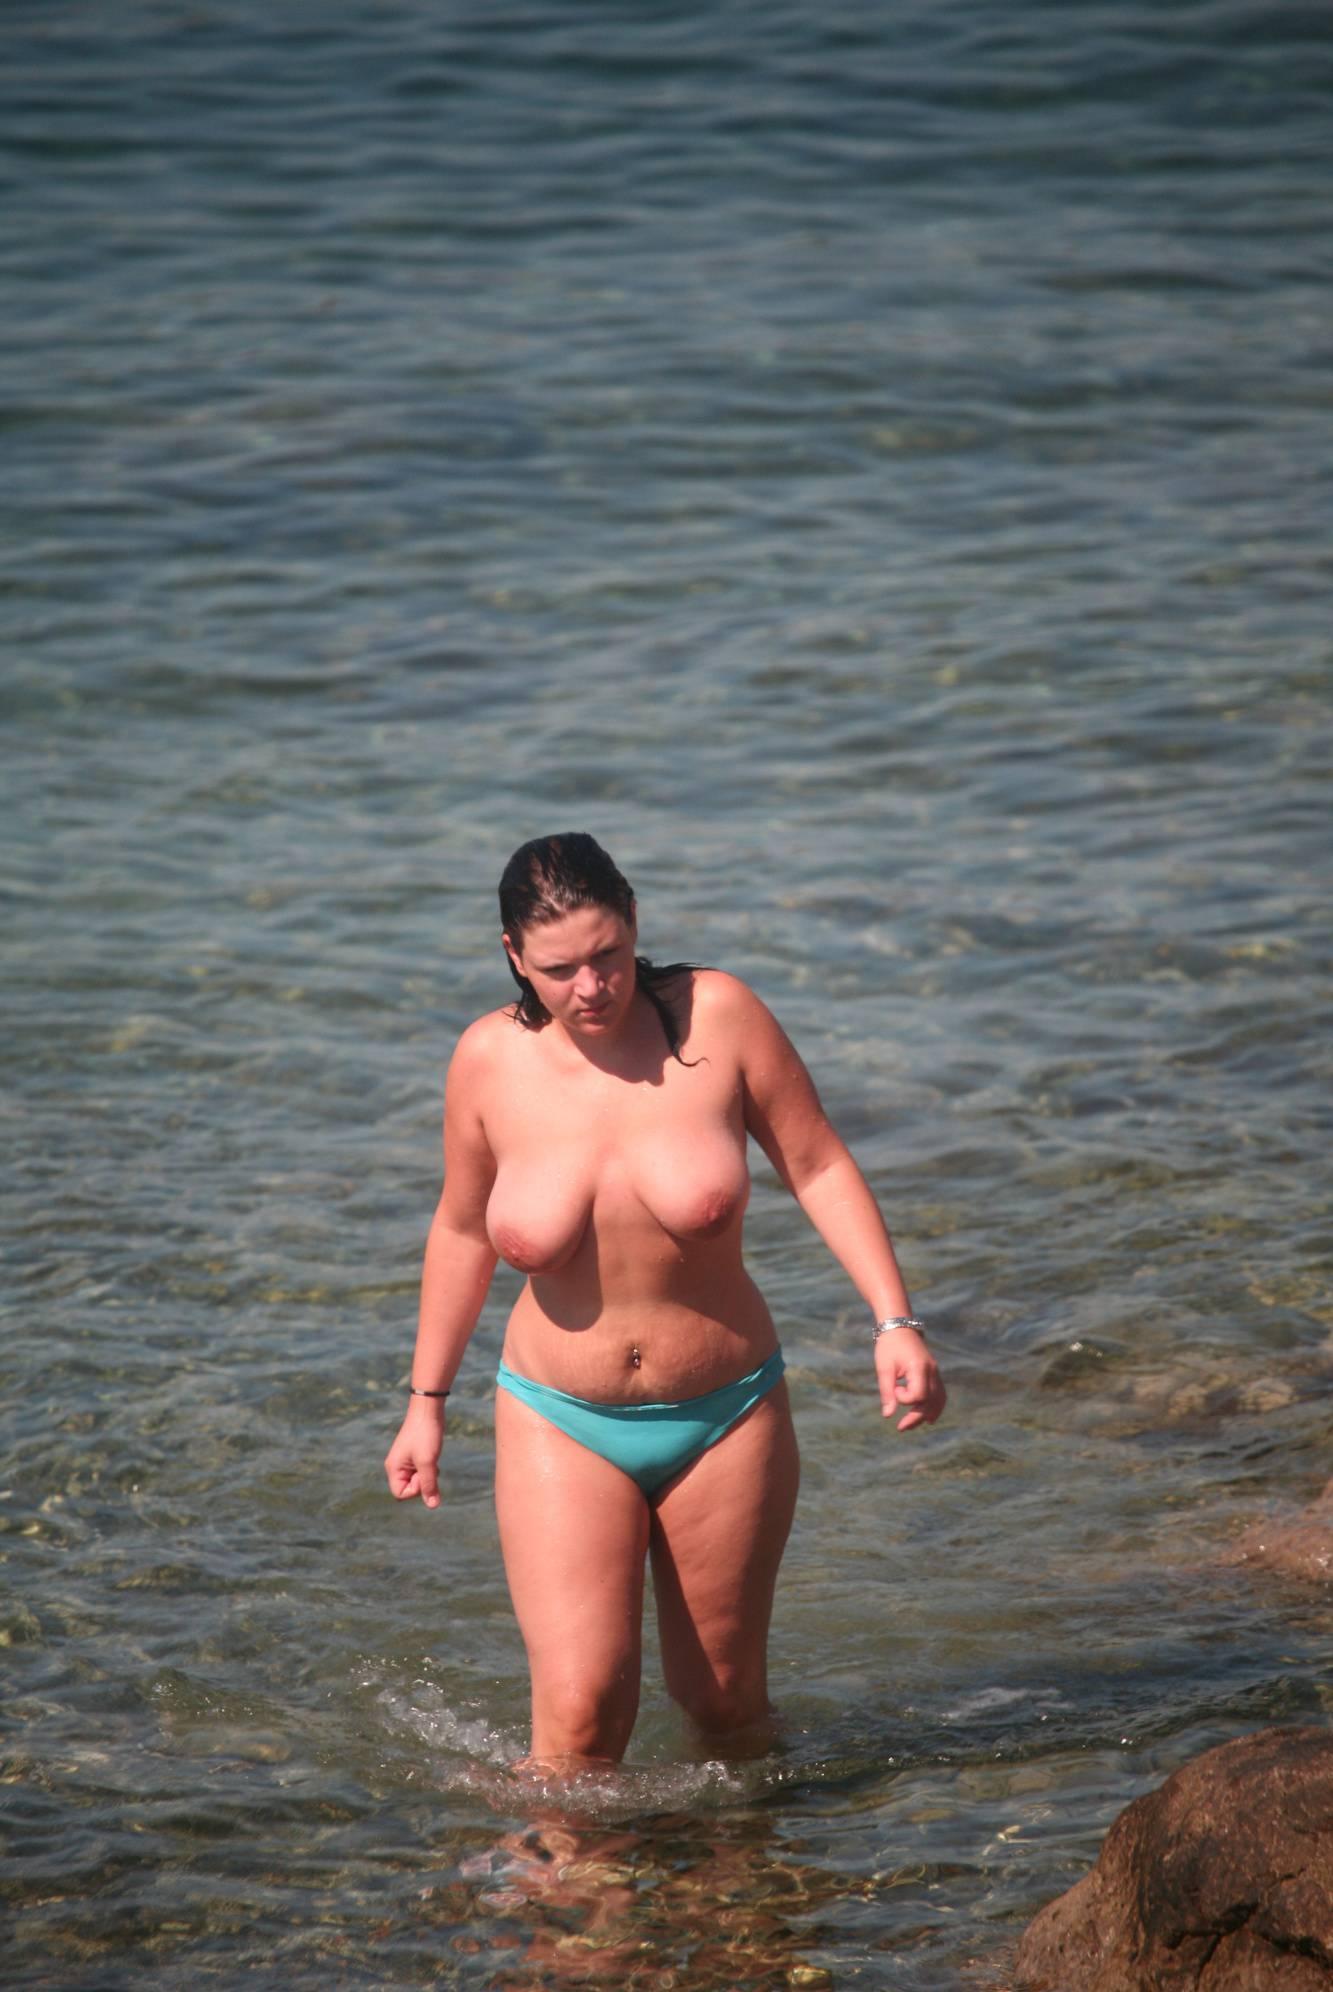 Nudist Photos Crete Parenting Couple - 1